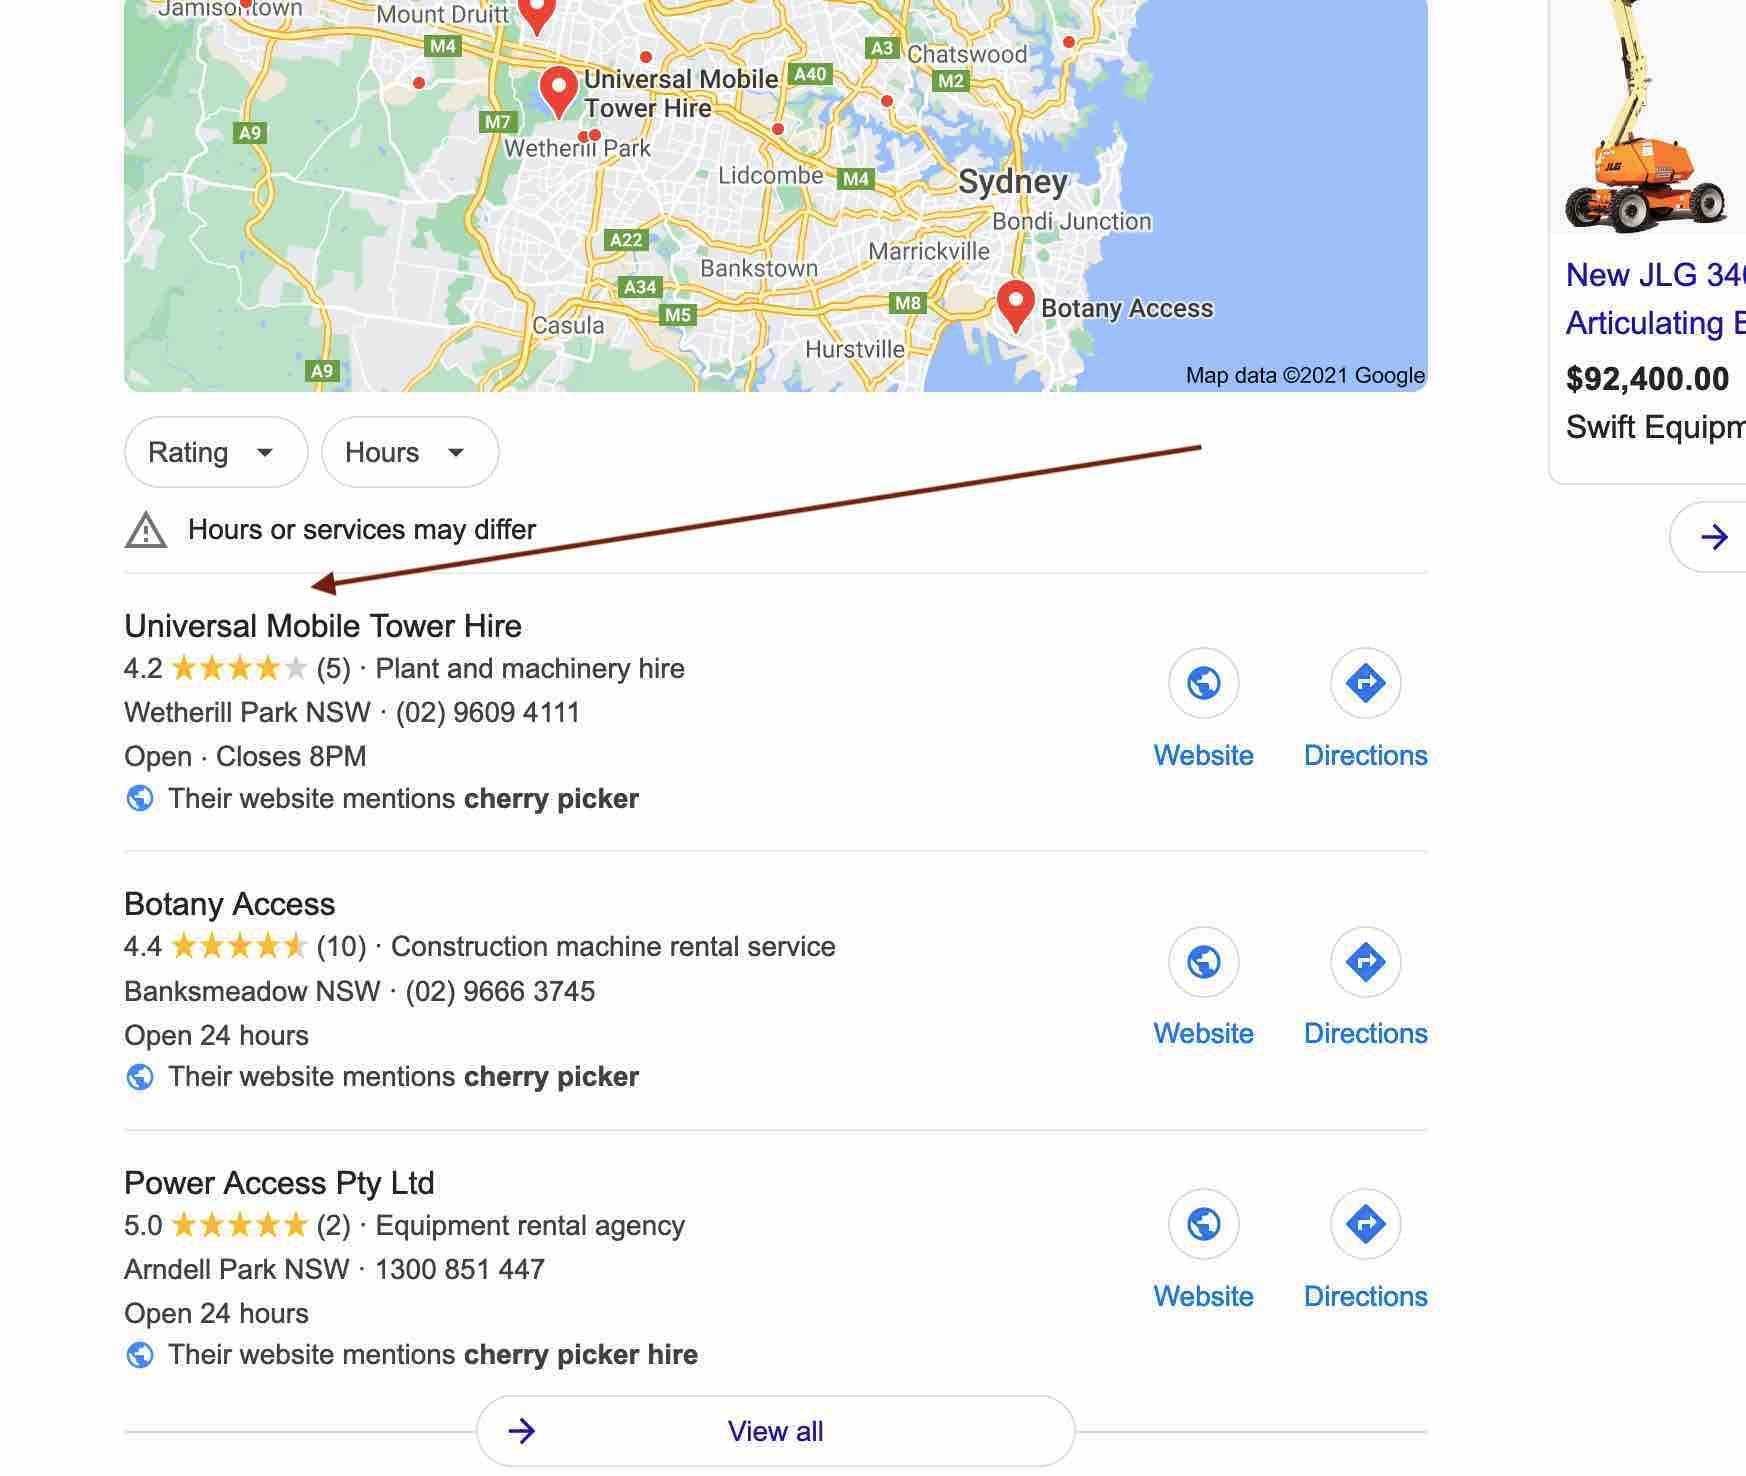 UMTH case study - google maps